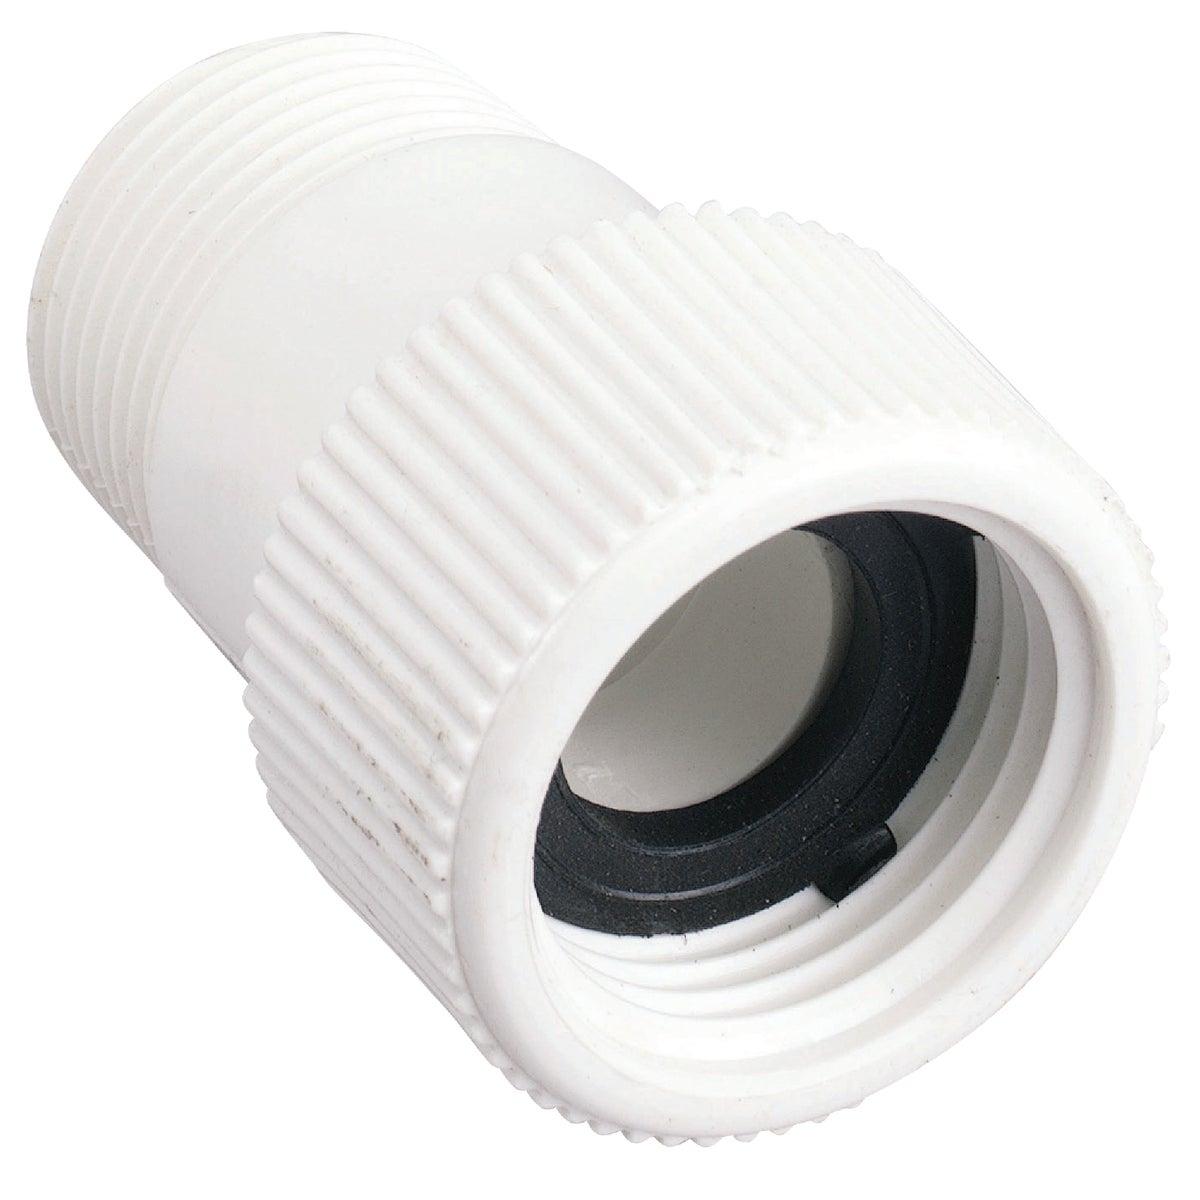 PVC HOSE COUPLING